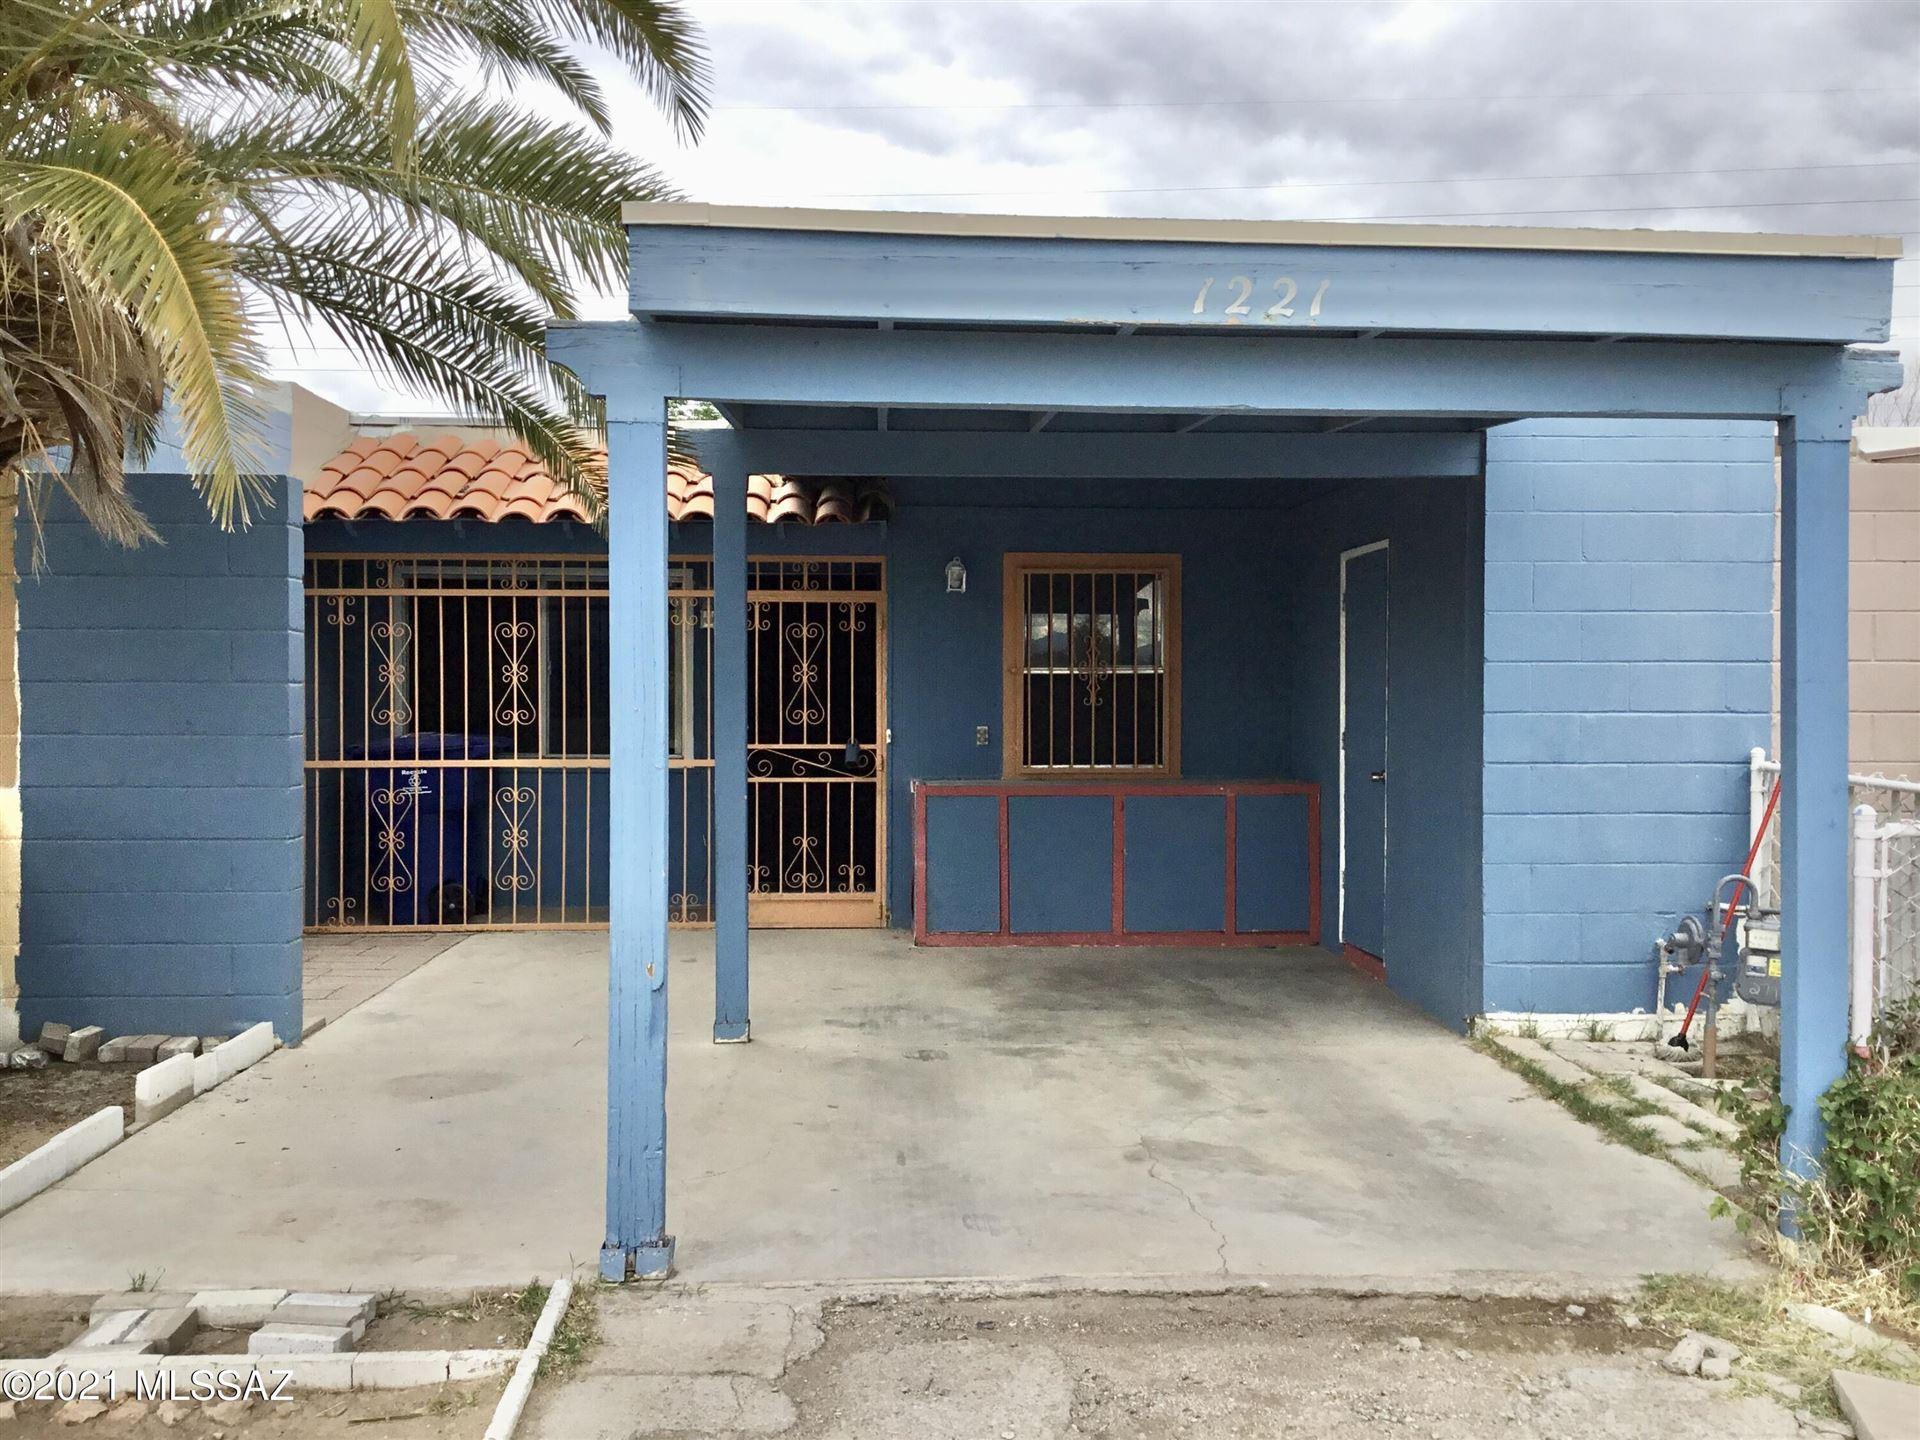 1221 E DREXEL Road, Tucson, AZ 85706 - MLS#: 22110932